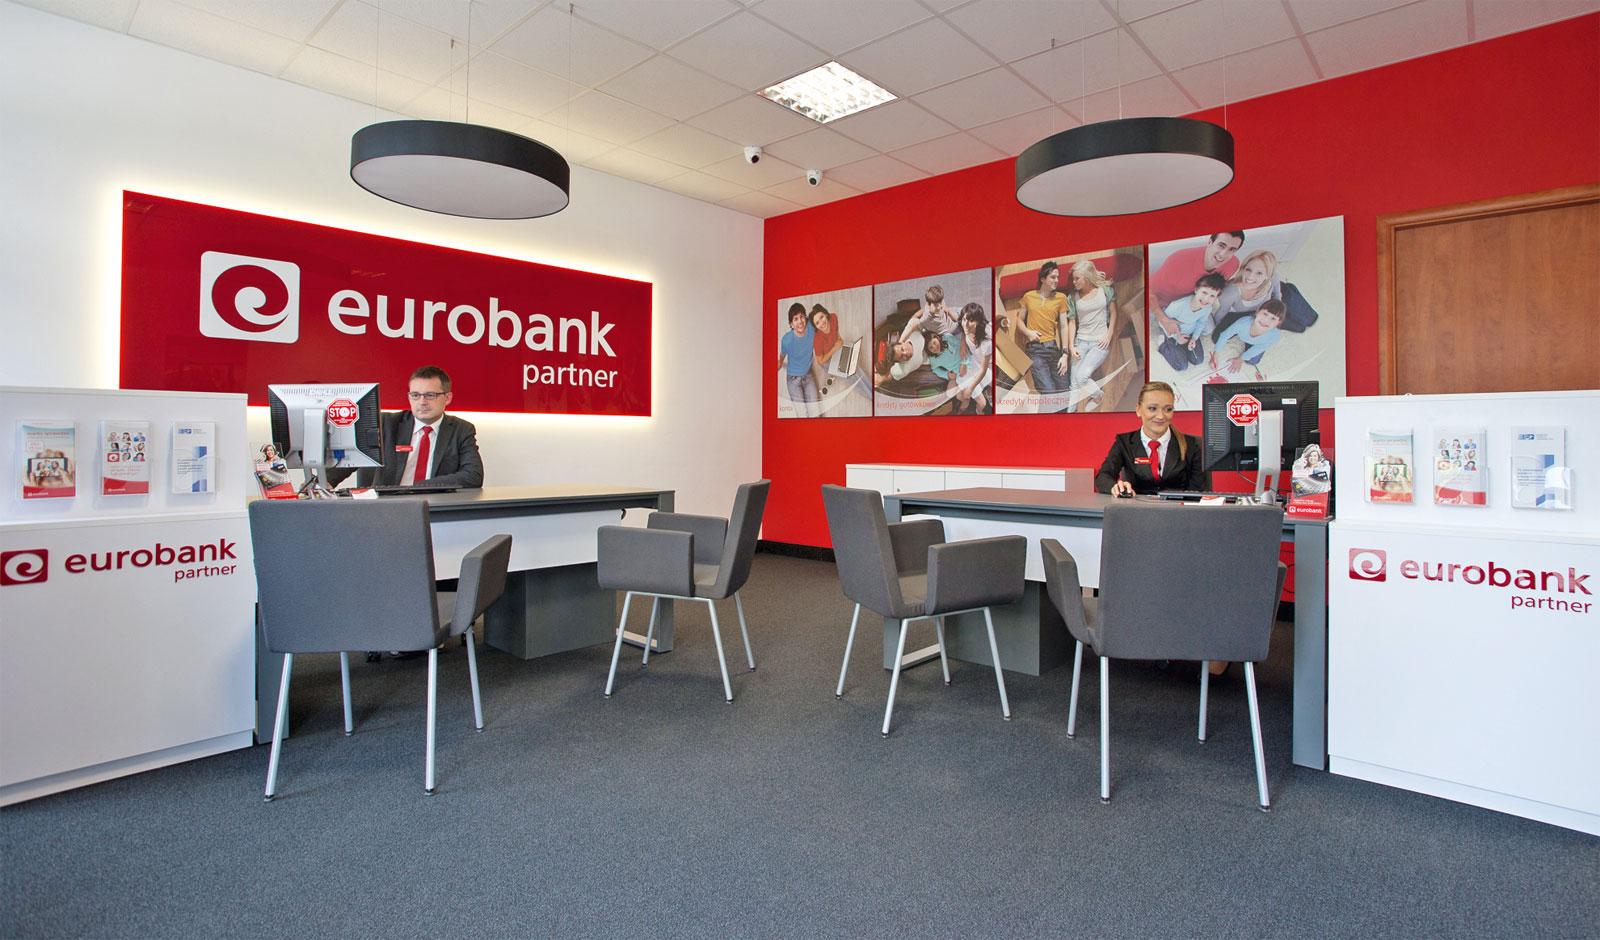 Za ile własny bank?